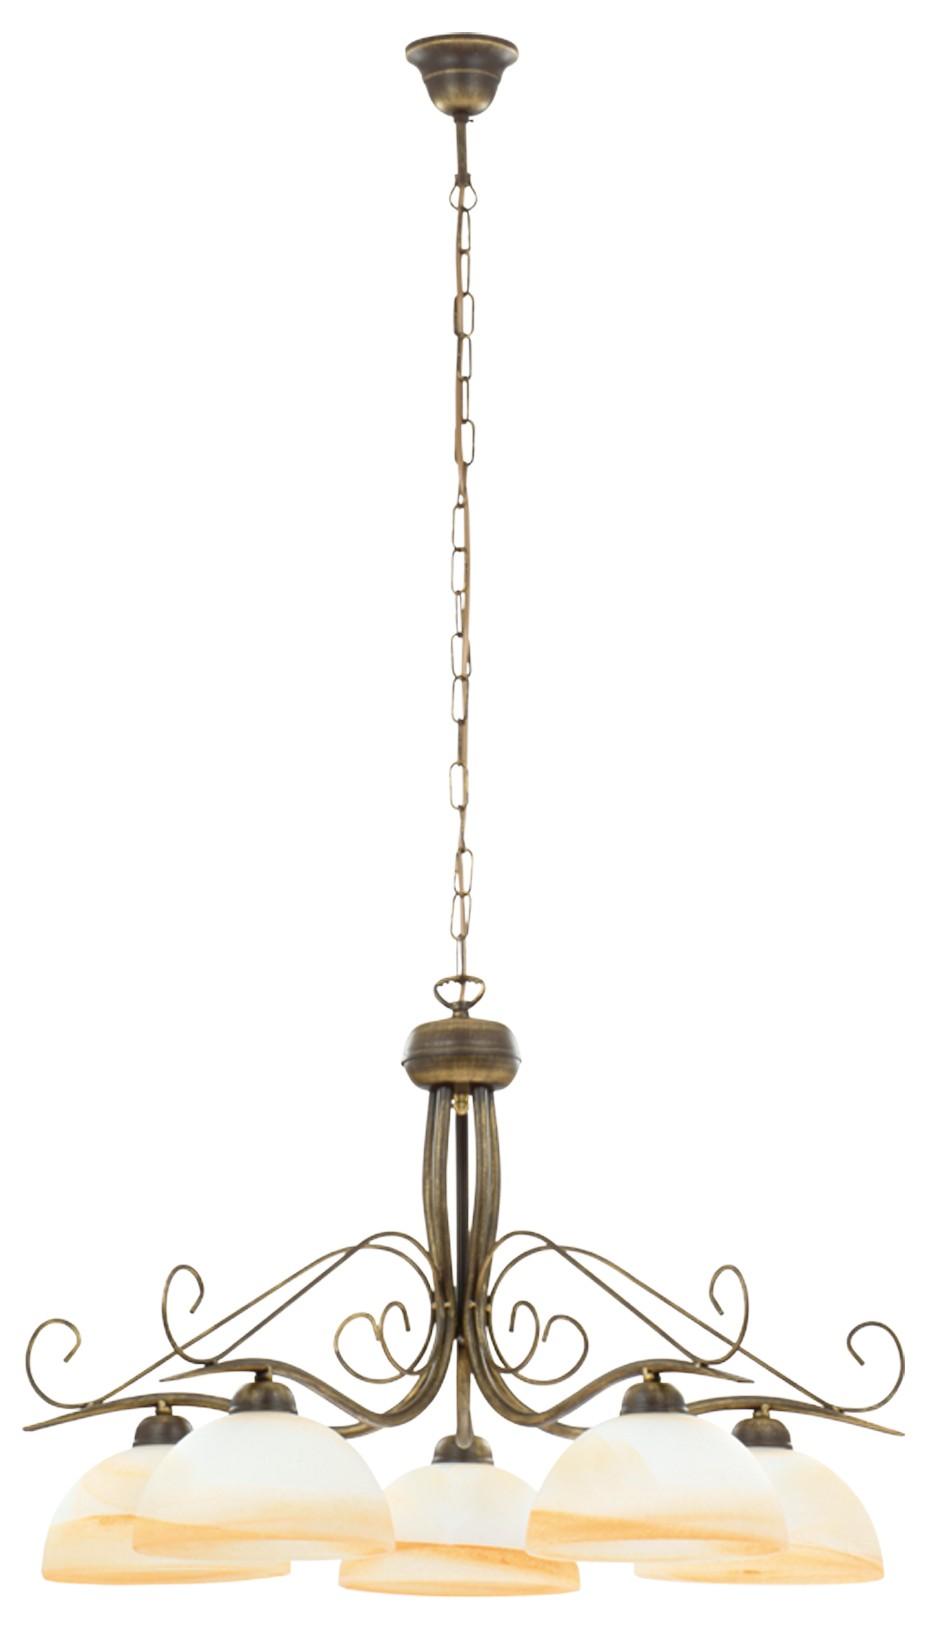 dedeman fiona 5 lustra 5xe27 385 lustre lustre si candelabre iluminat de interior. Black Bedroom Furniture Sets. Home Design Ideas